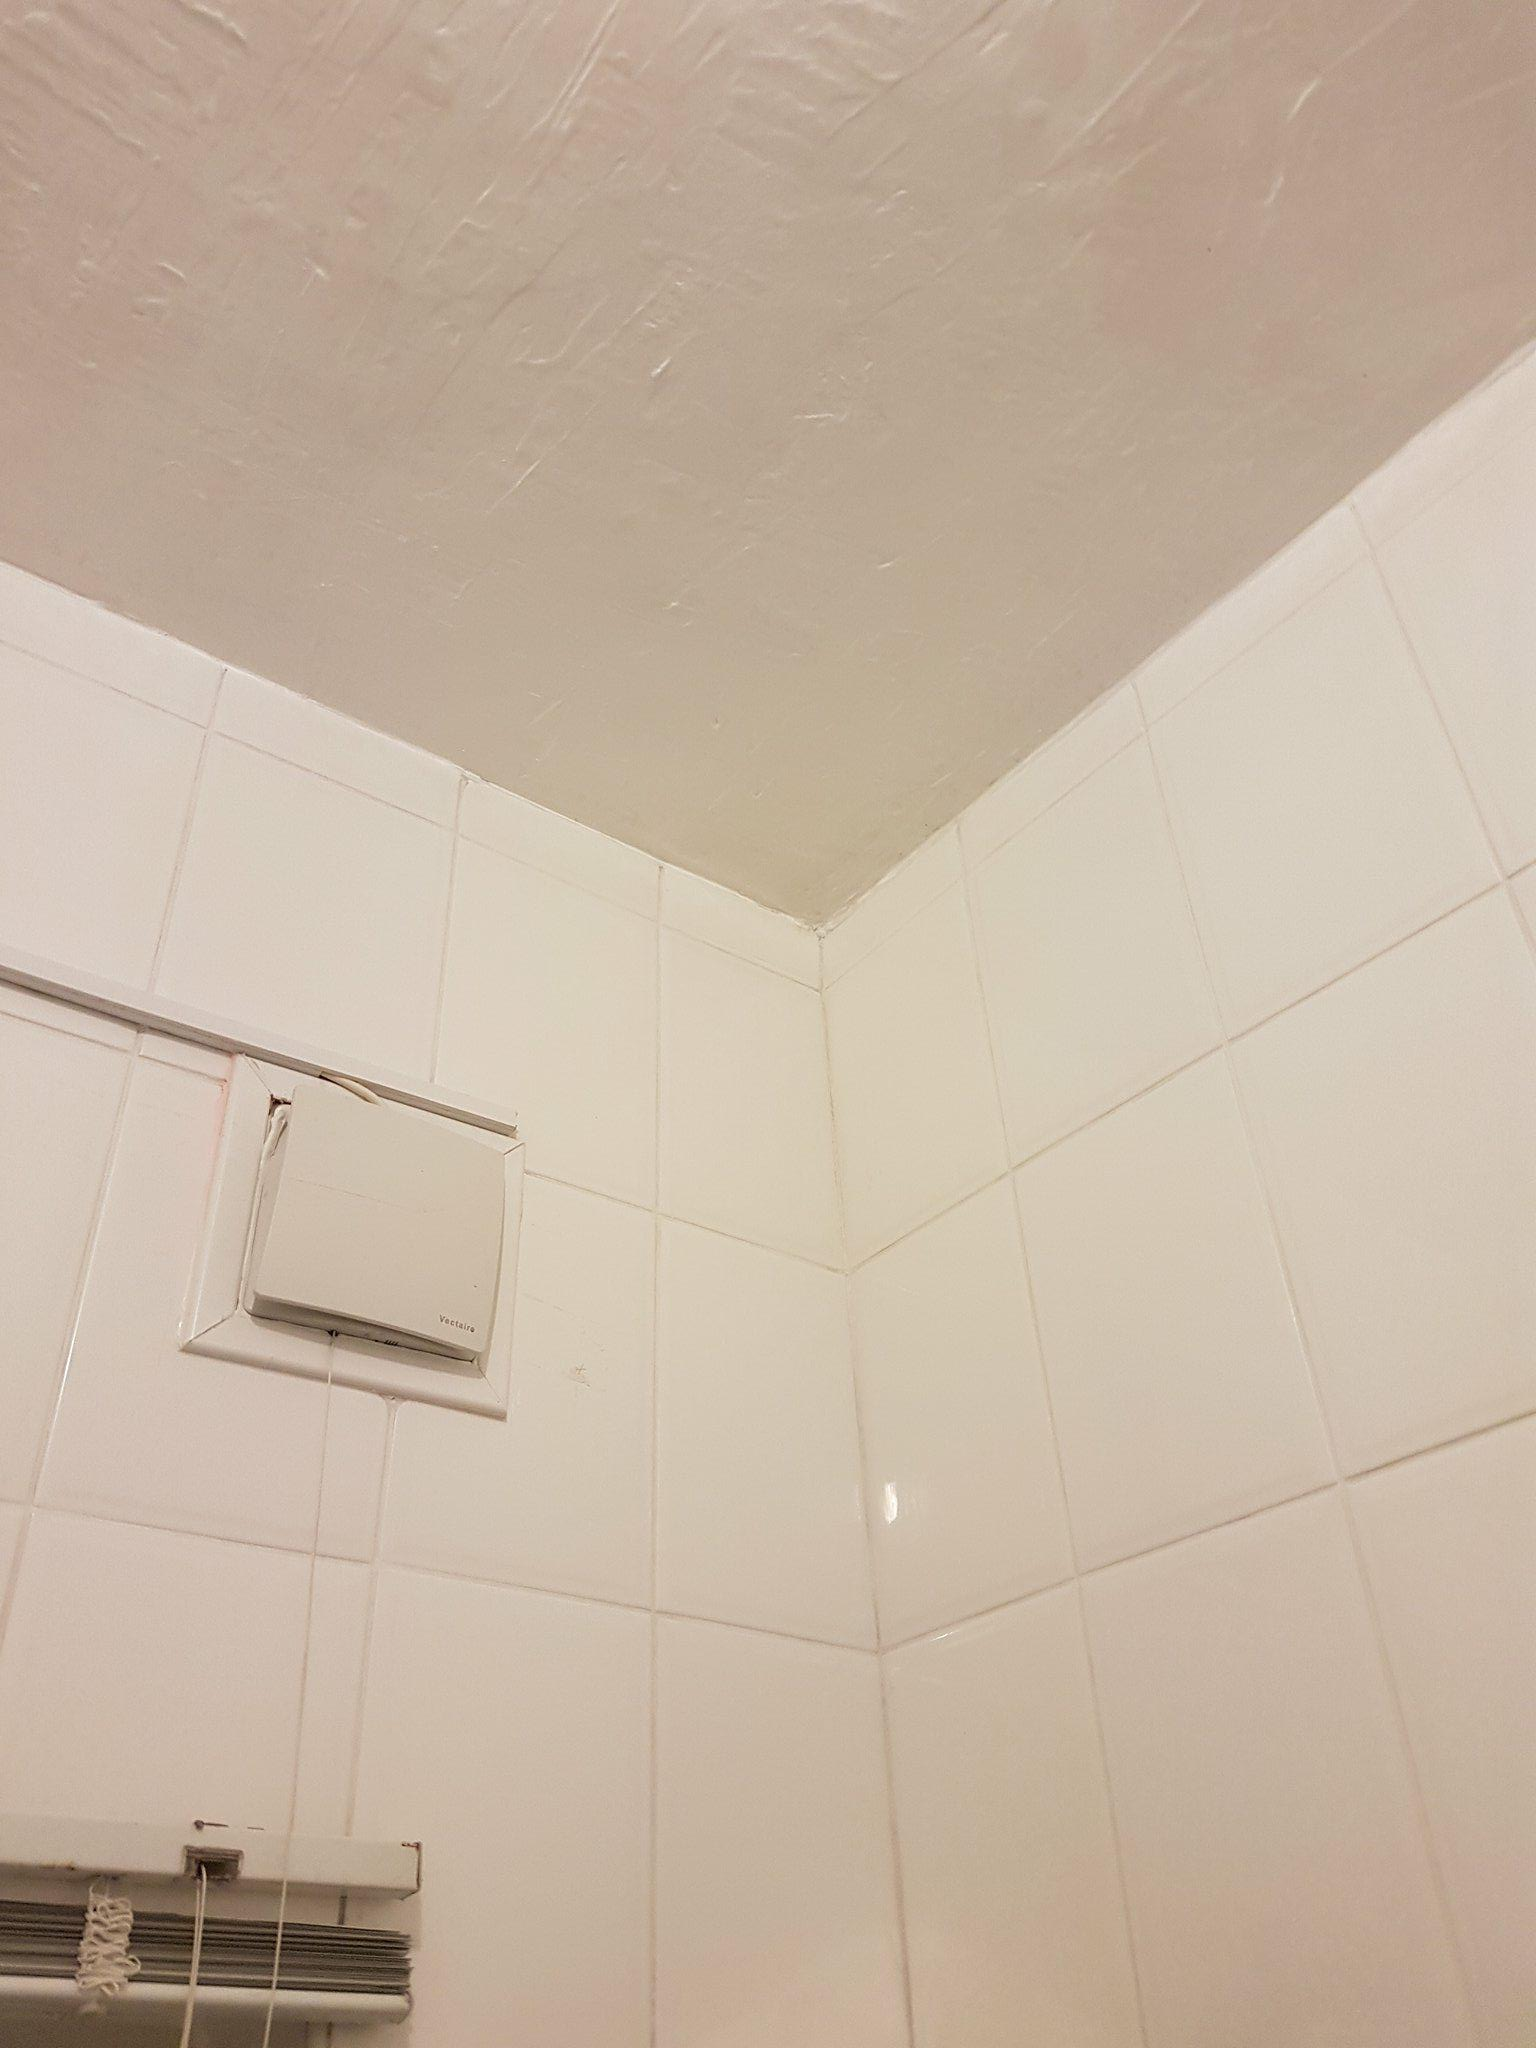 Mouldy Bathroom After Restoration in Eccles